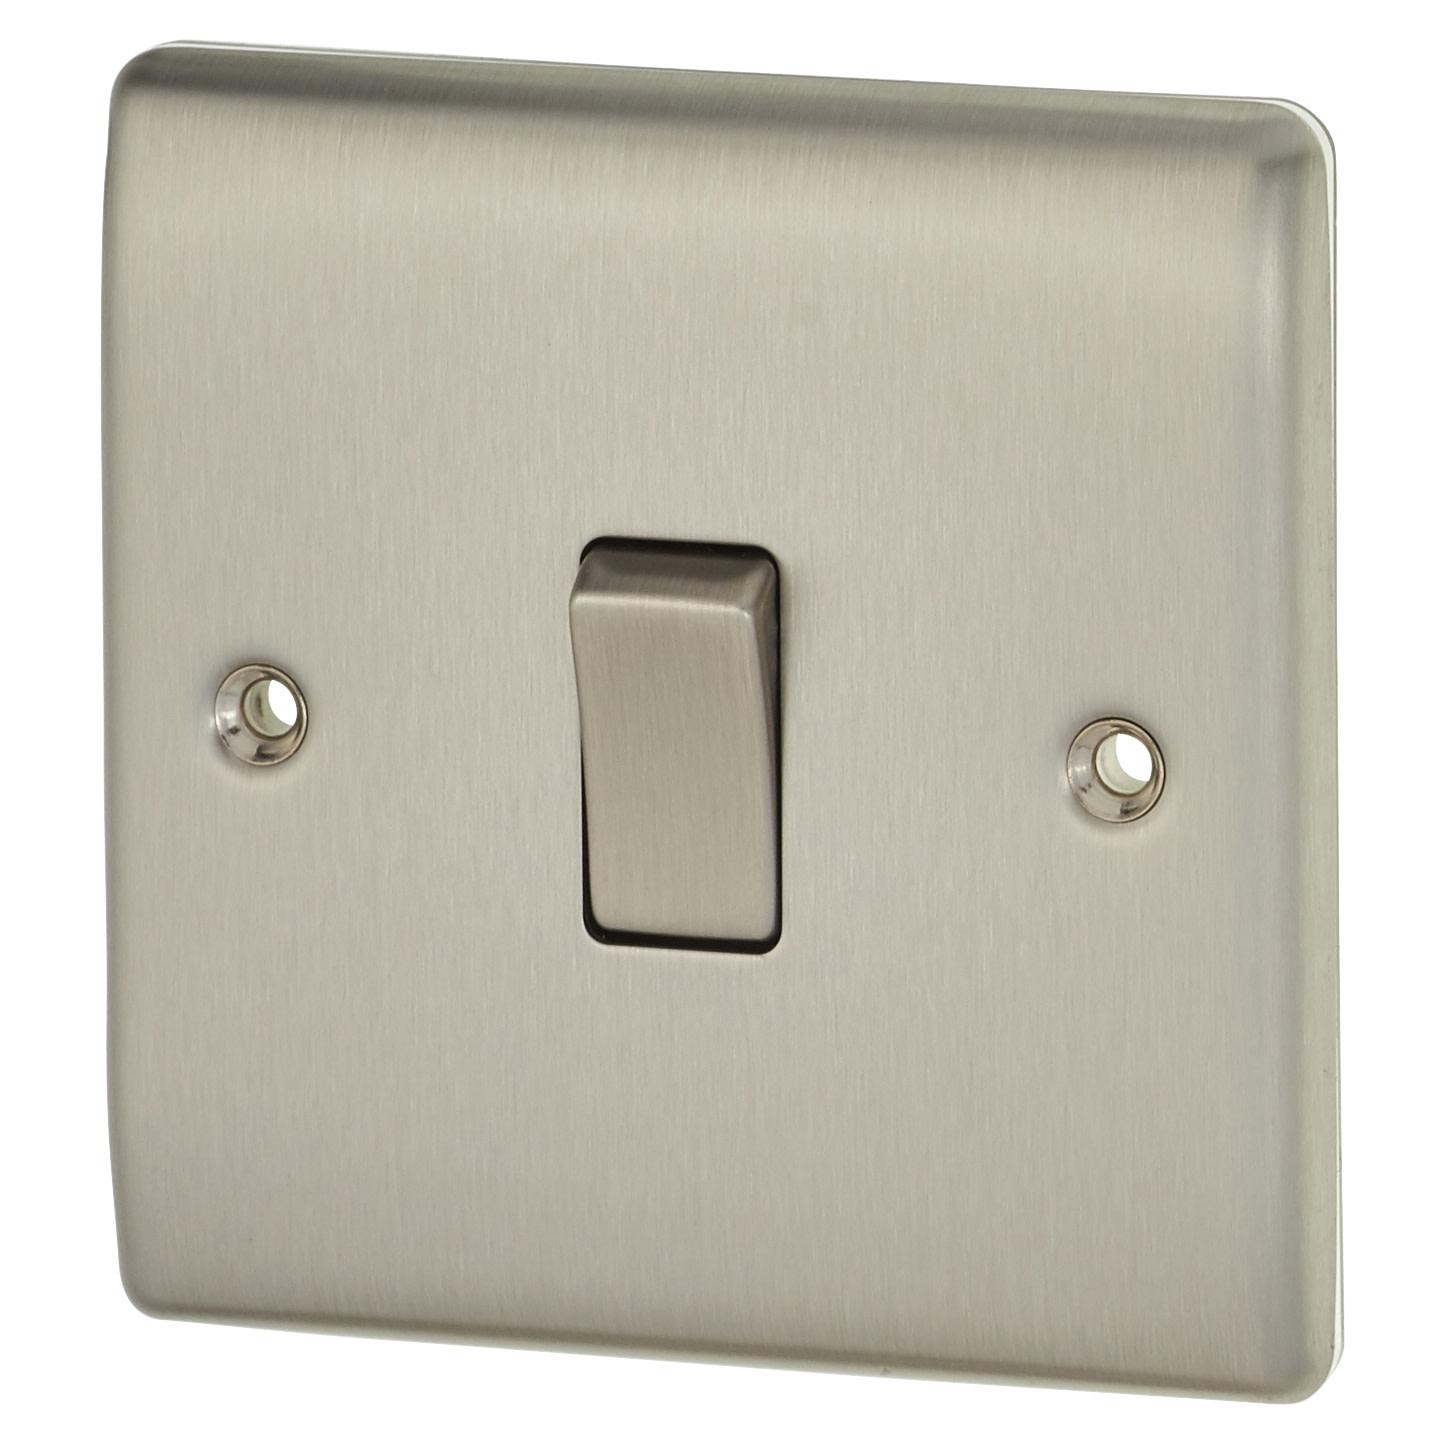 BG 10A 1 Gang 2 Way Single Pole Light Switch - Brushed Steel)